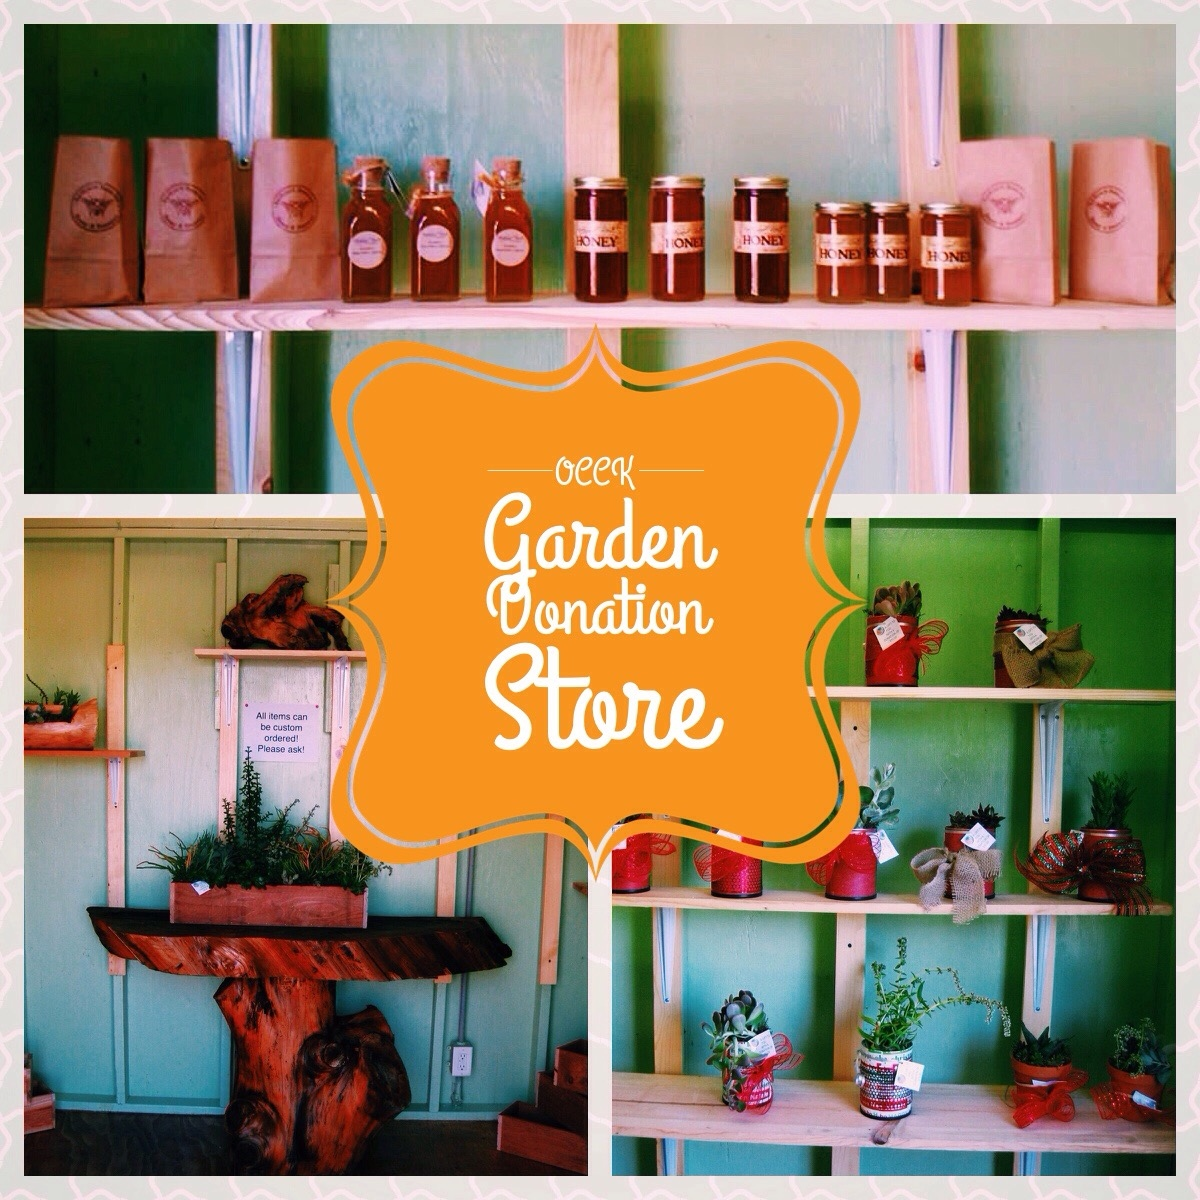 garden_store.jpg